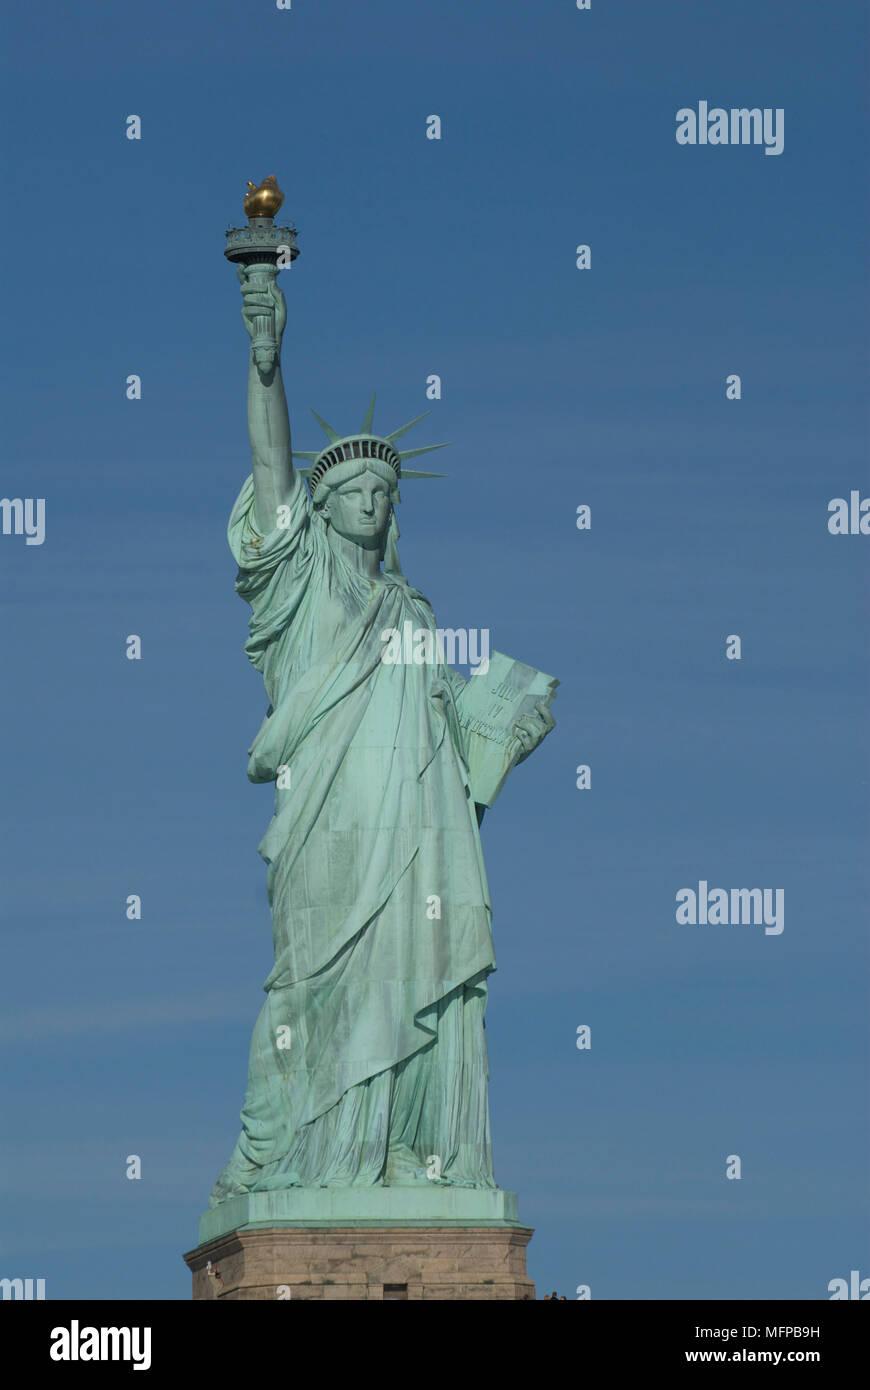 Statue Of Liberty Ship Tour